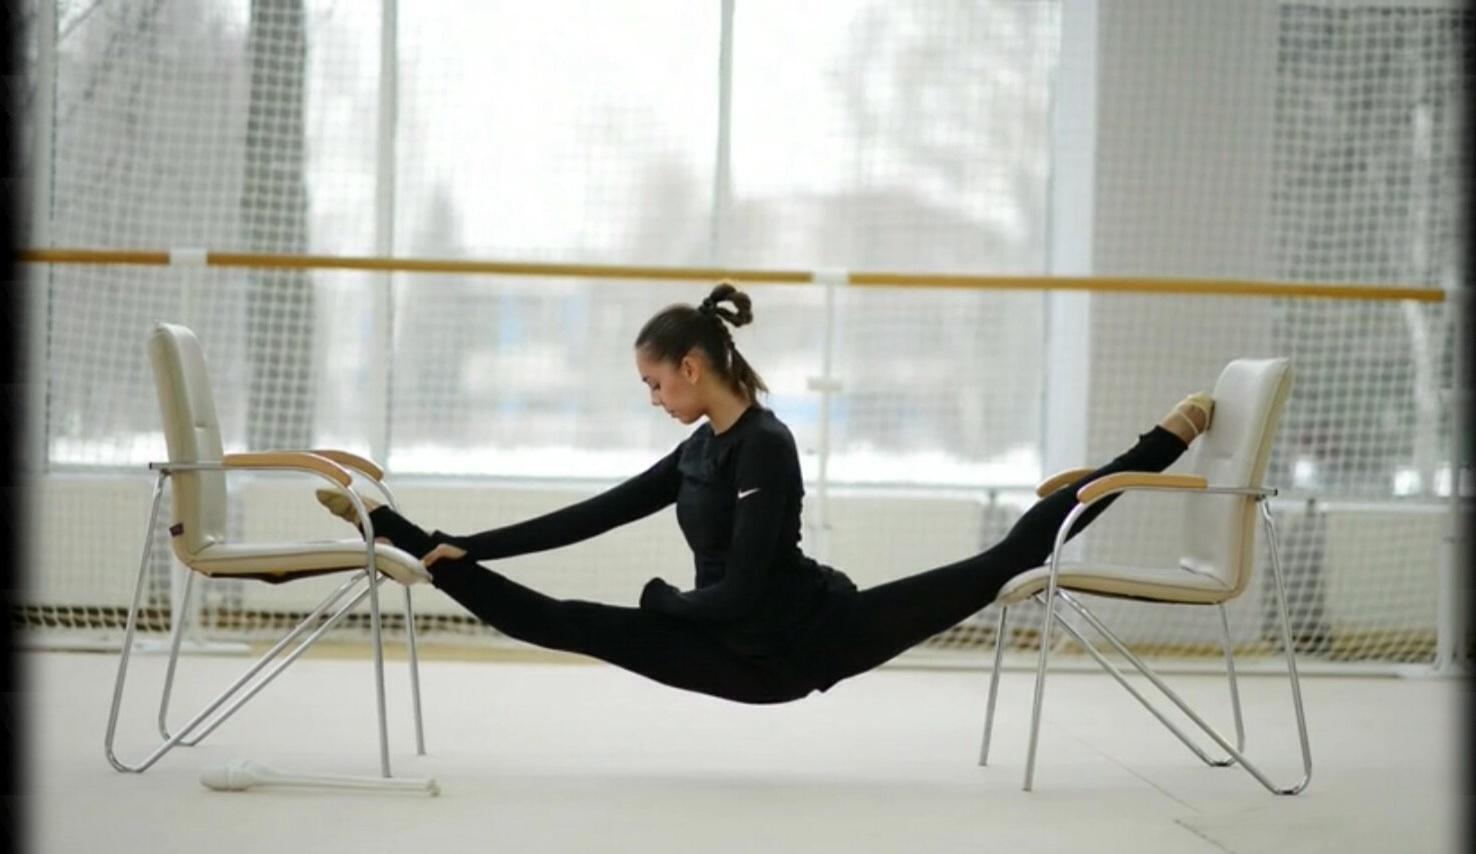 margarita mamun rhythmic gymnastics rhythmic gymnastics info